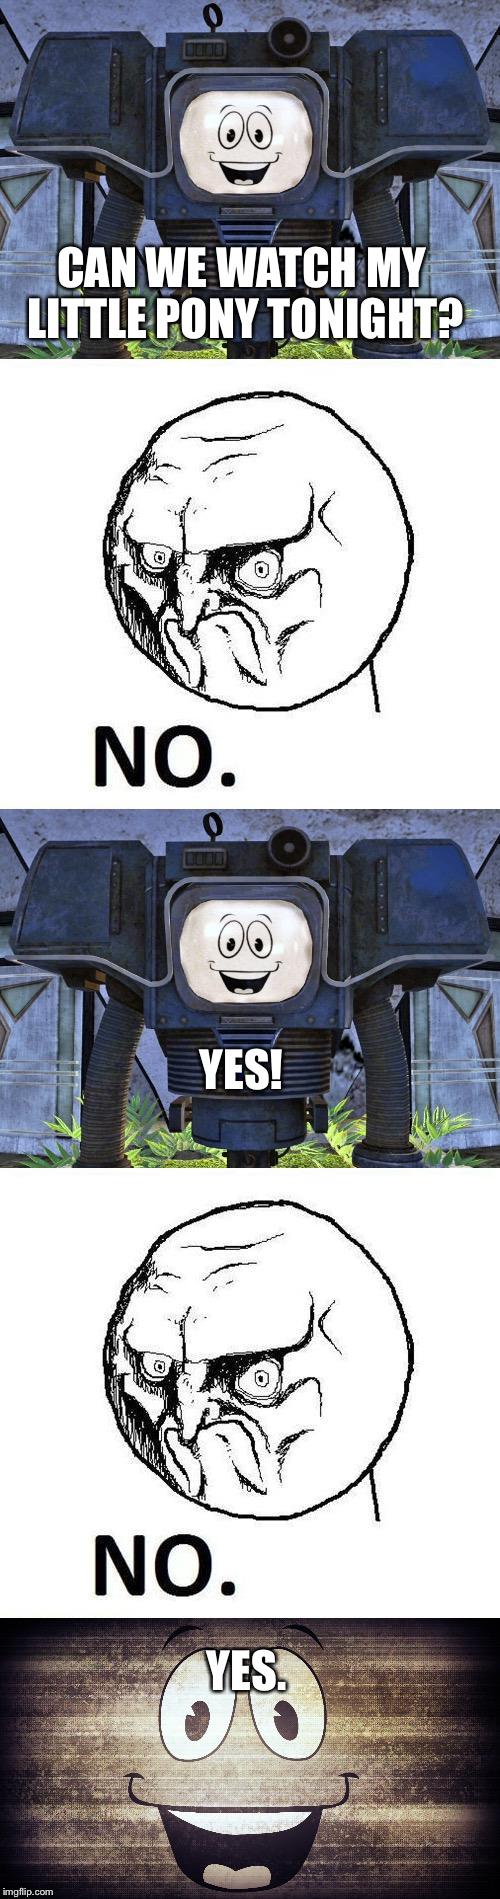 No Man vs. Yes Man - Imgflip